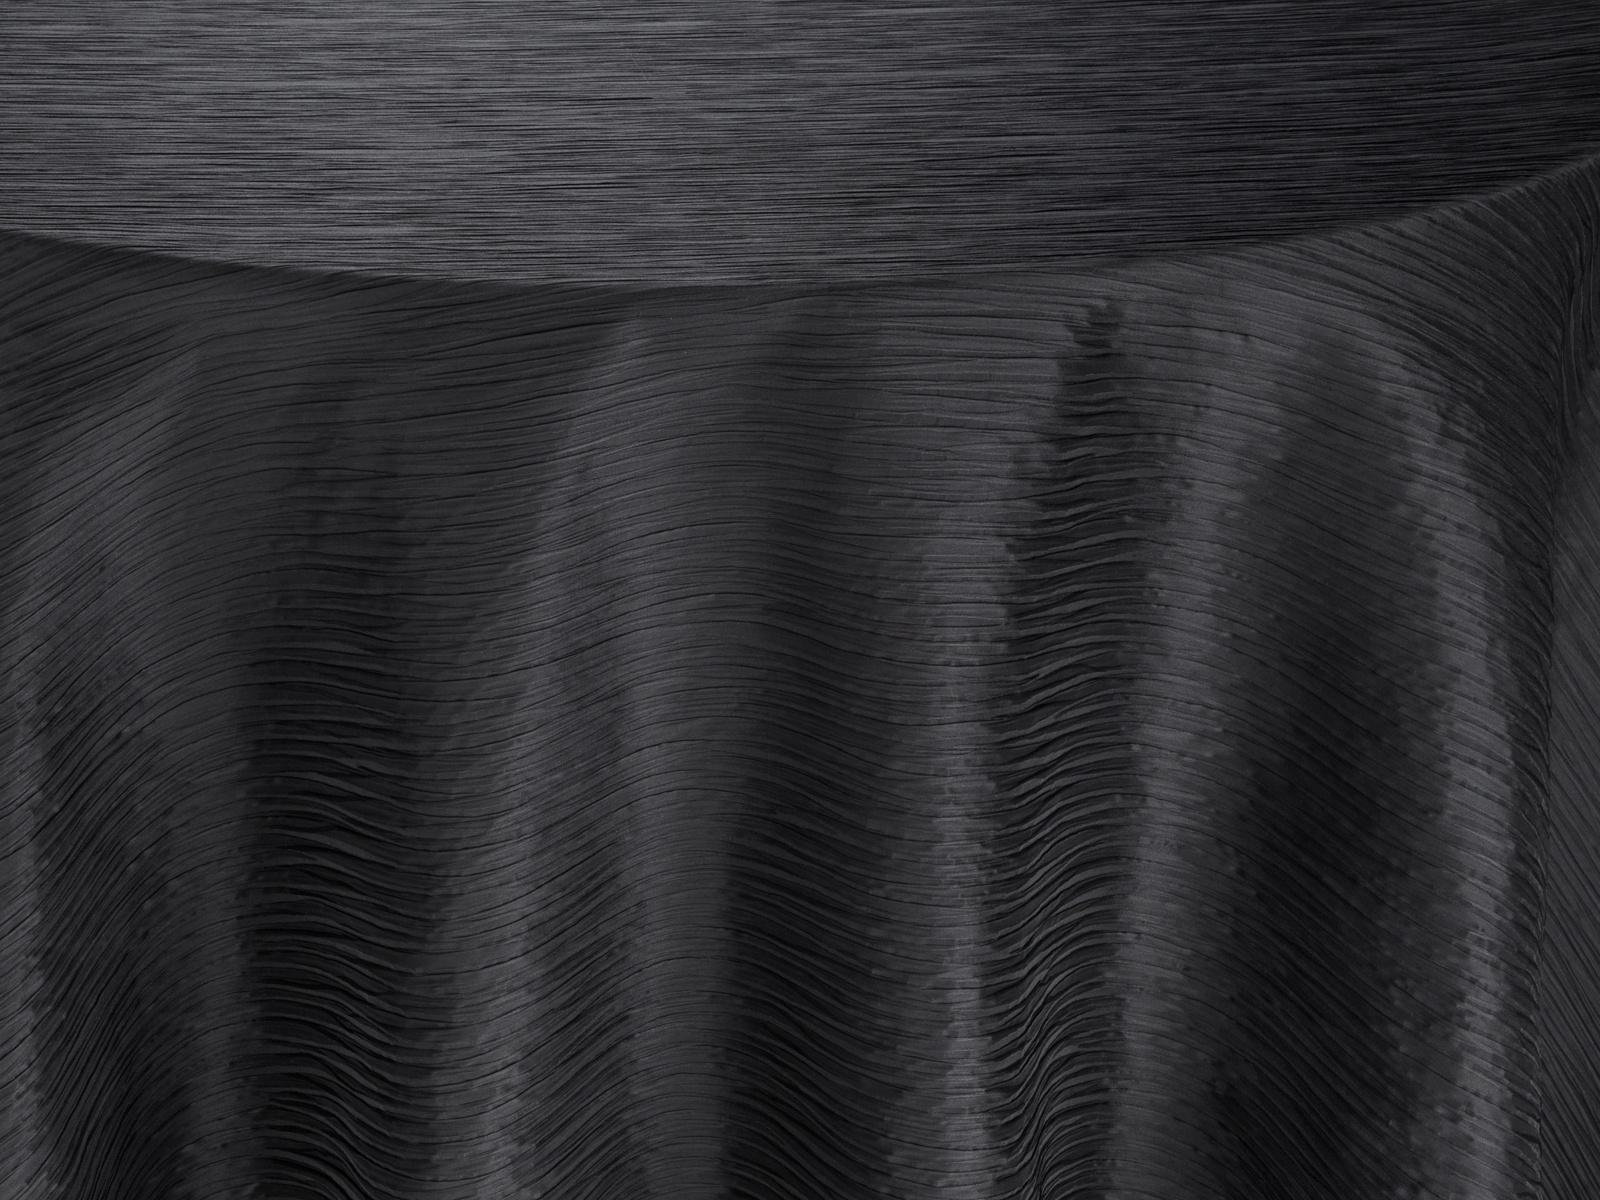 ebony-swell.jpg